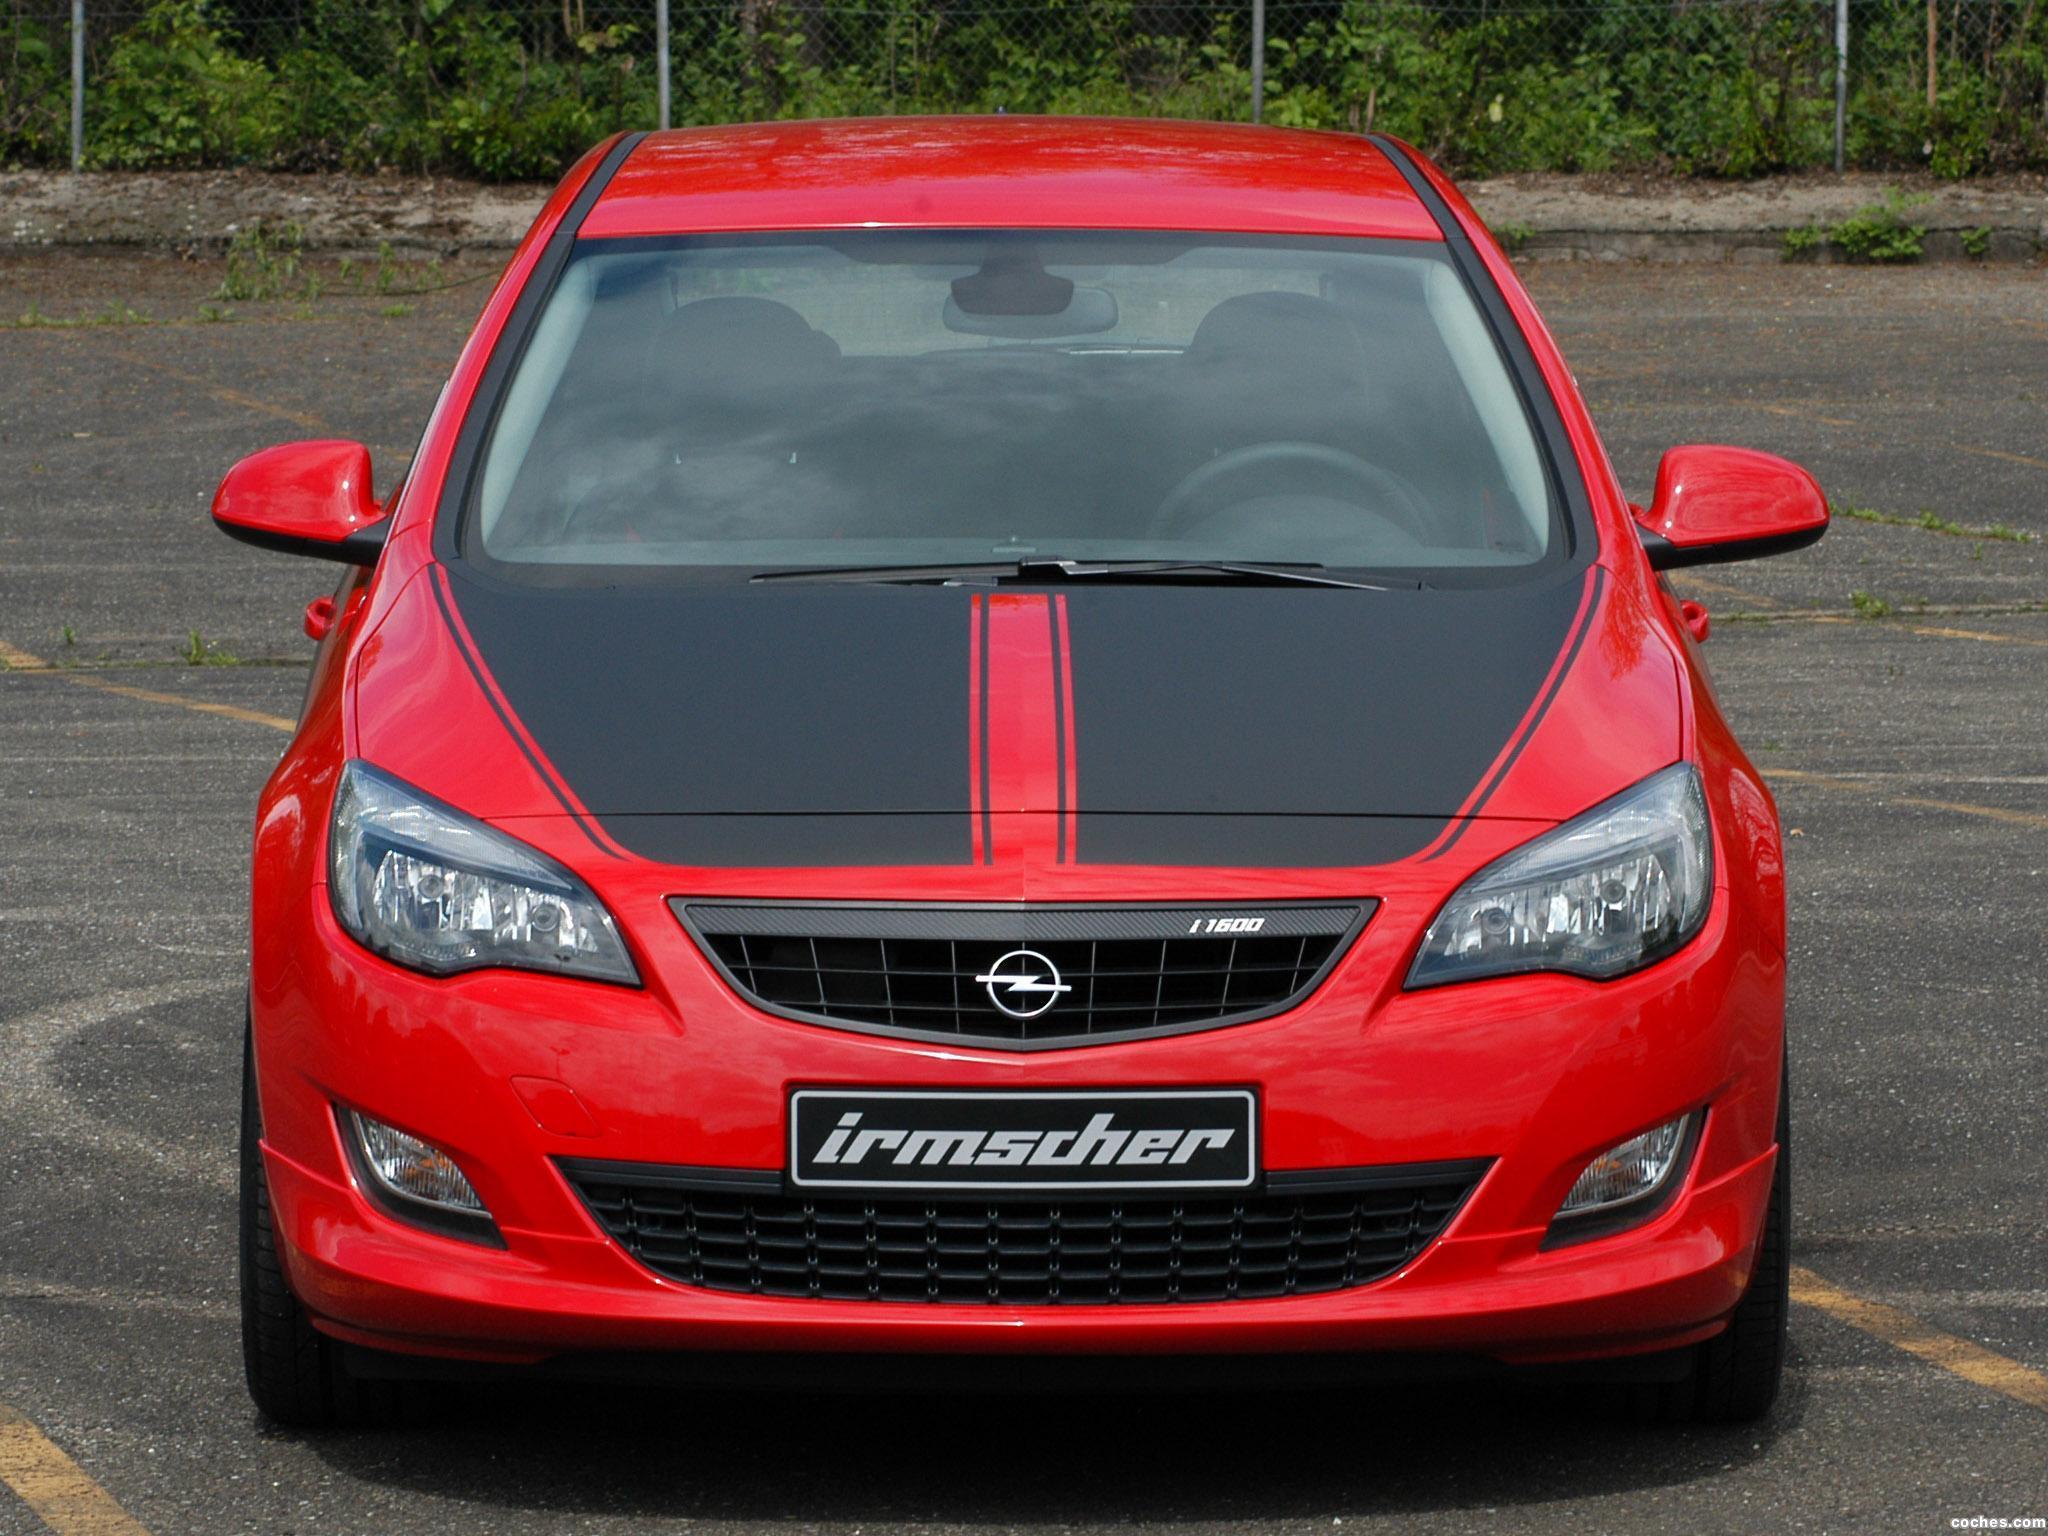 Foto 1 de Irmscher Opel Astra i1600 2010